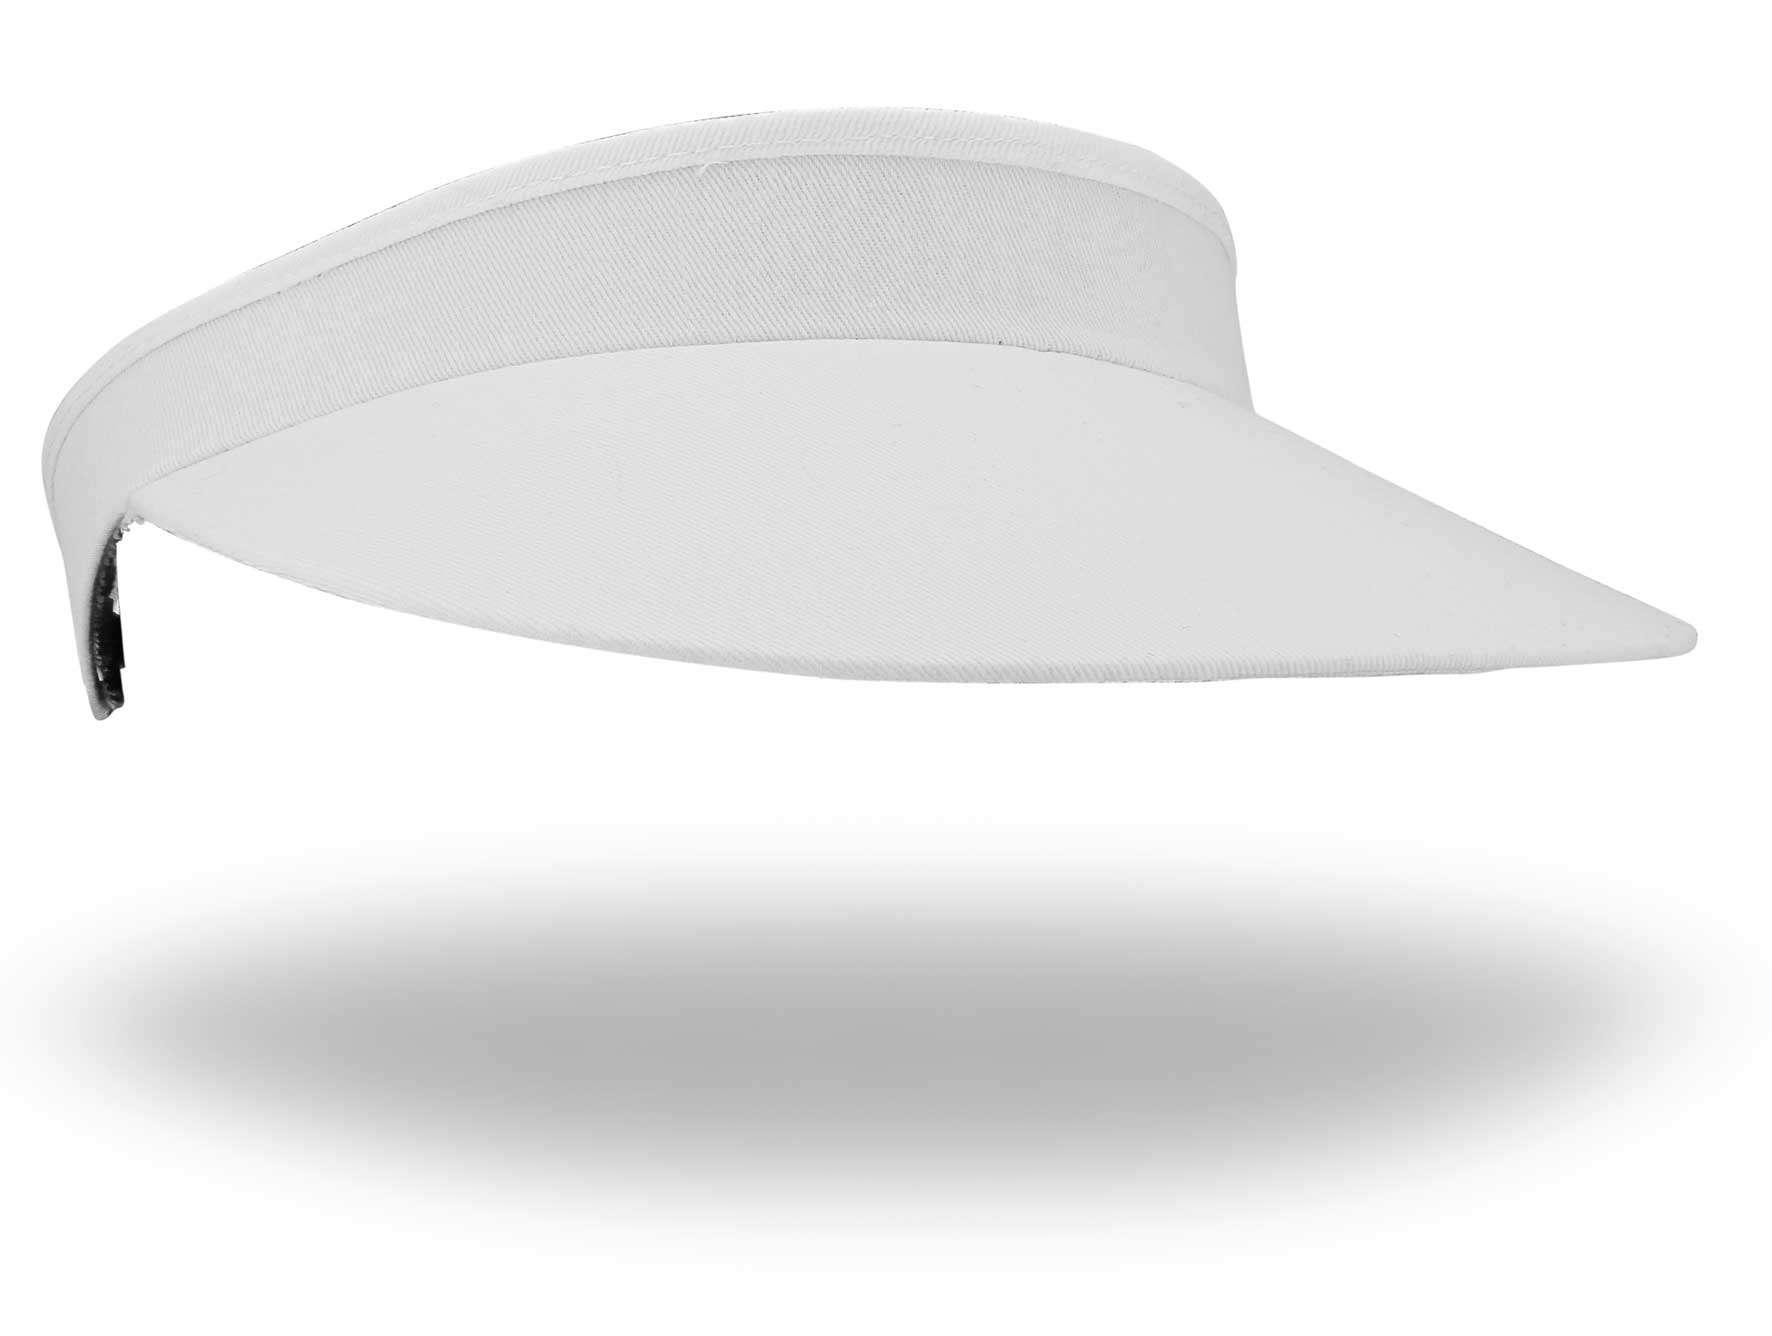 9b5f3cd61b9 White Curly Q Sun Visor-Adjustable - Emsmorn Bowlswear